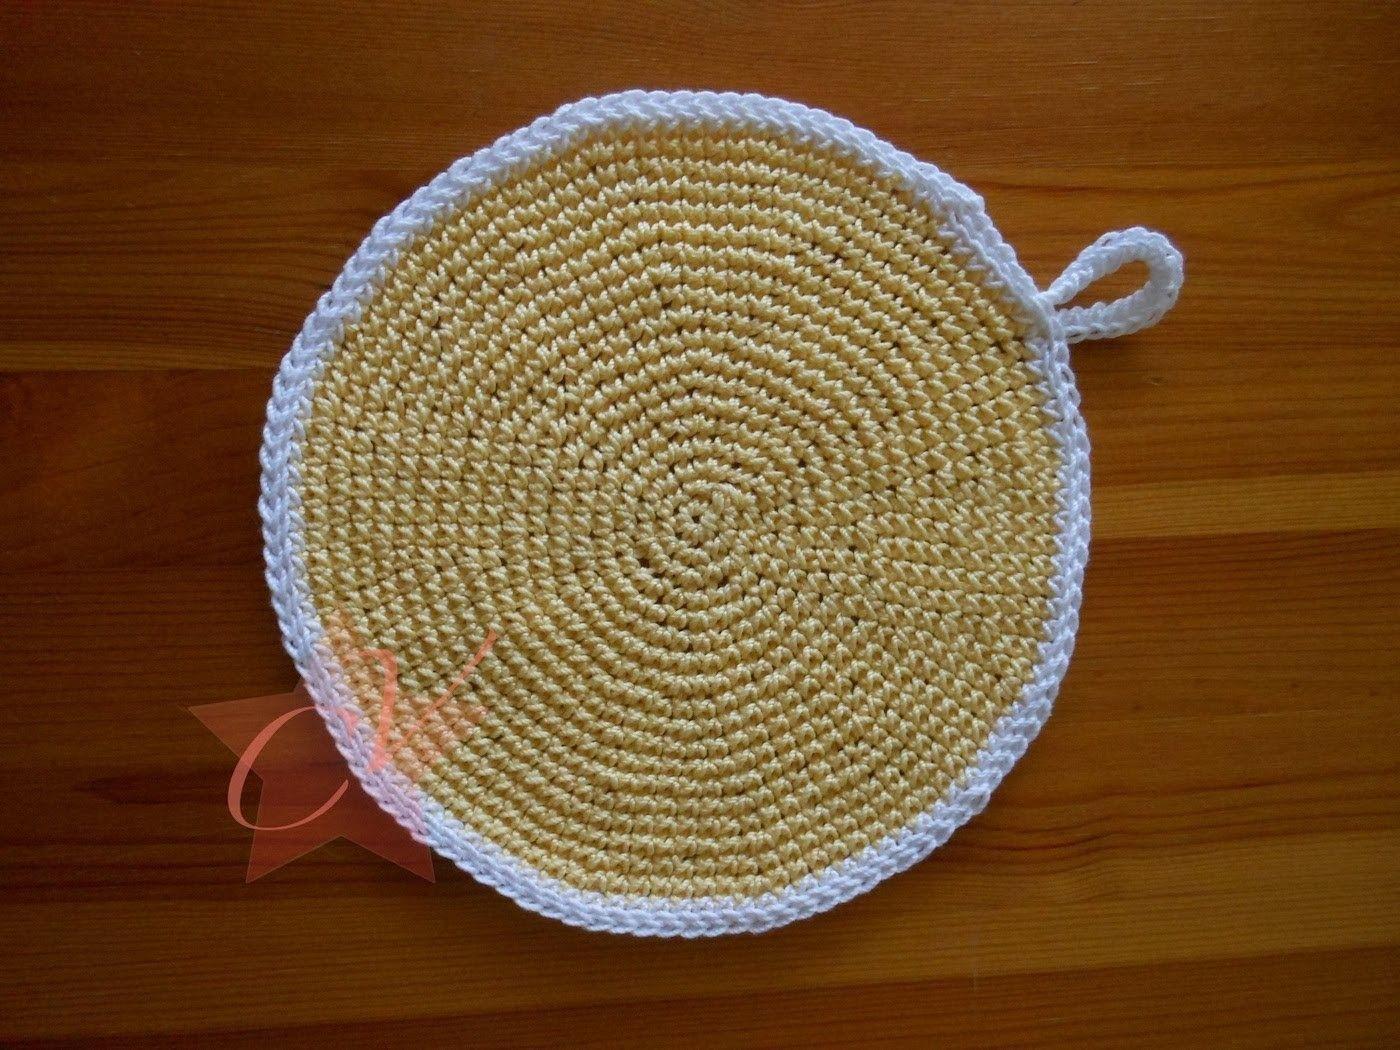 Round Crochet Pot Holder Tutorial Crochet Pinterest